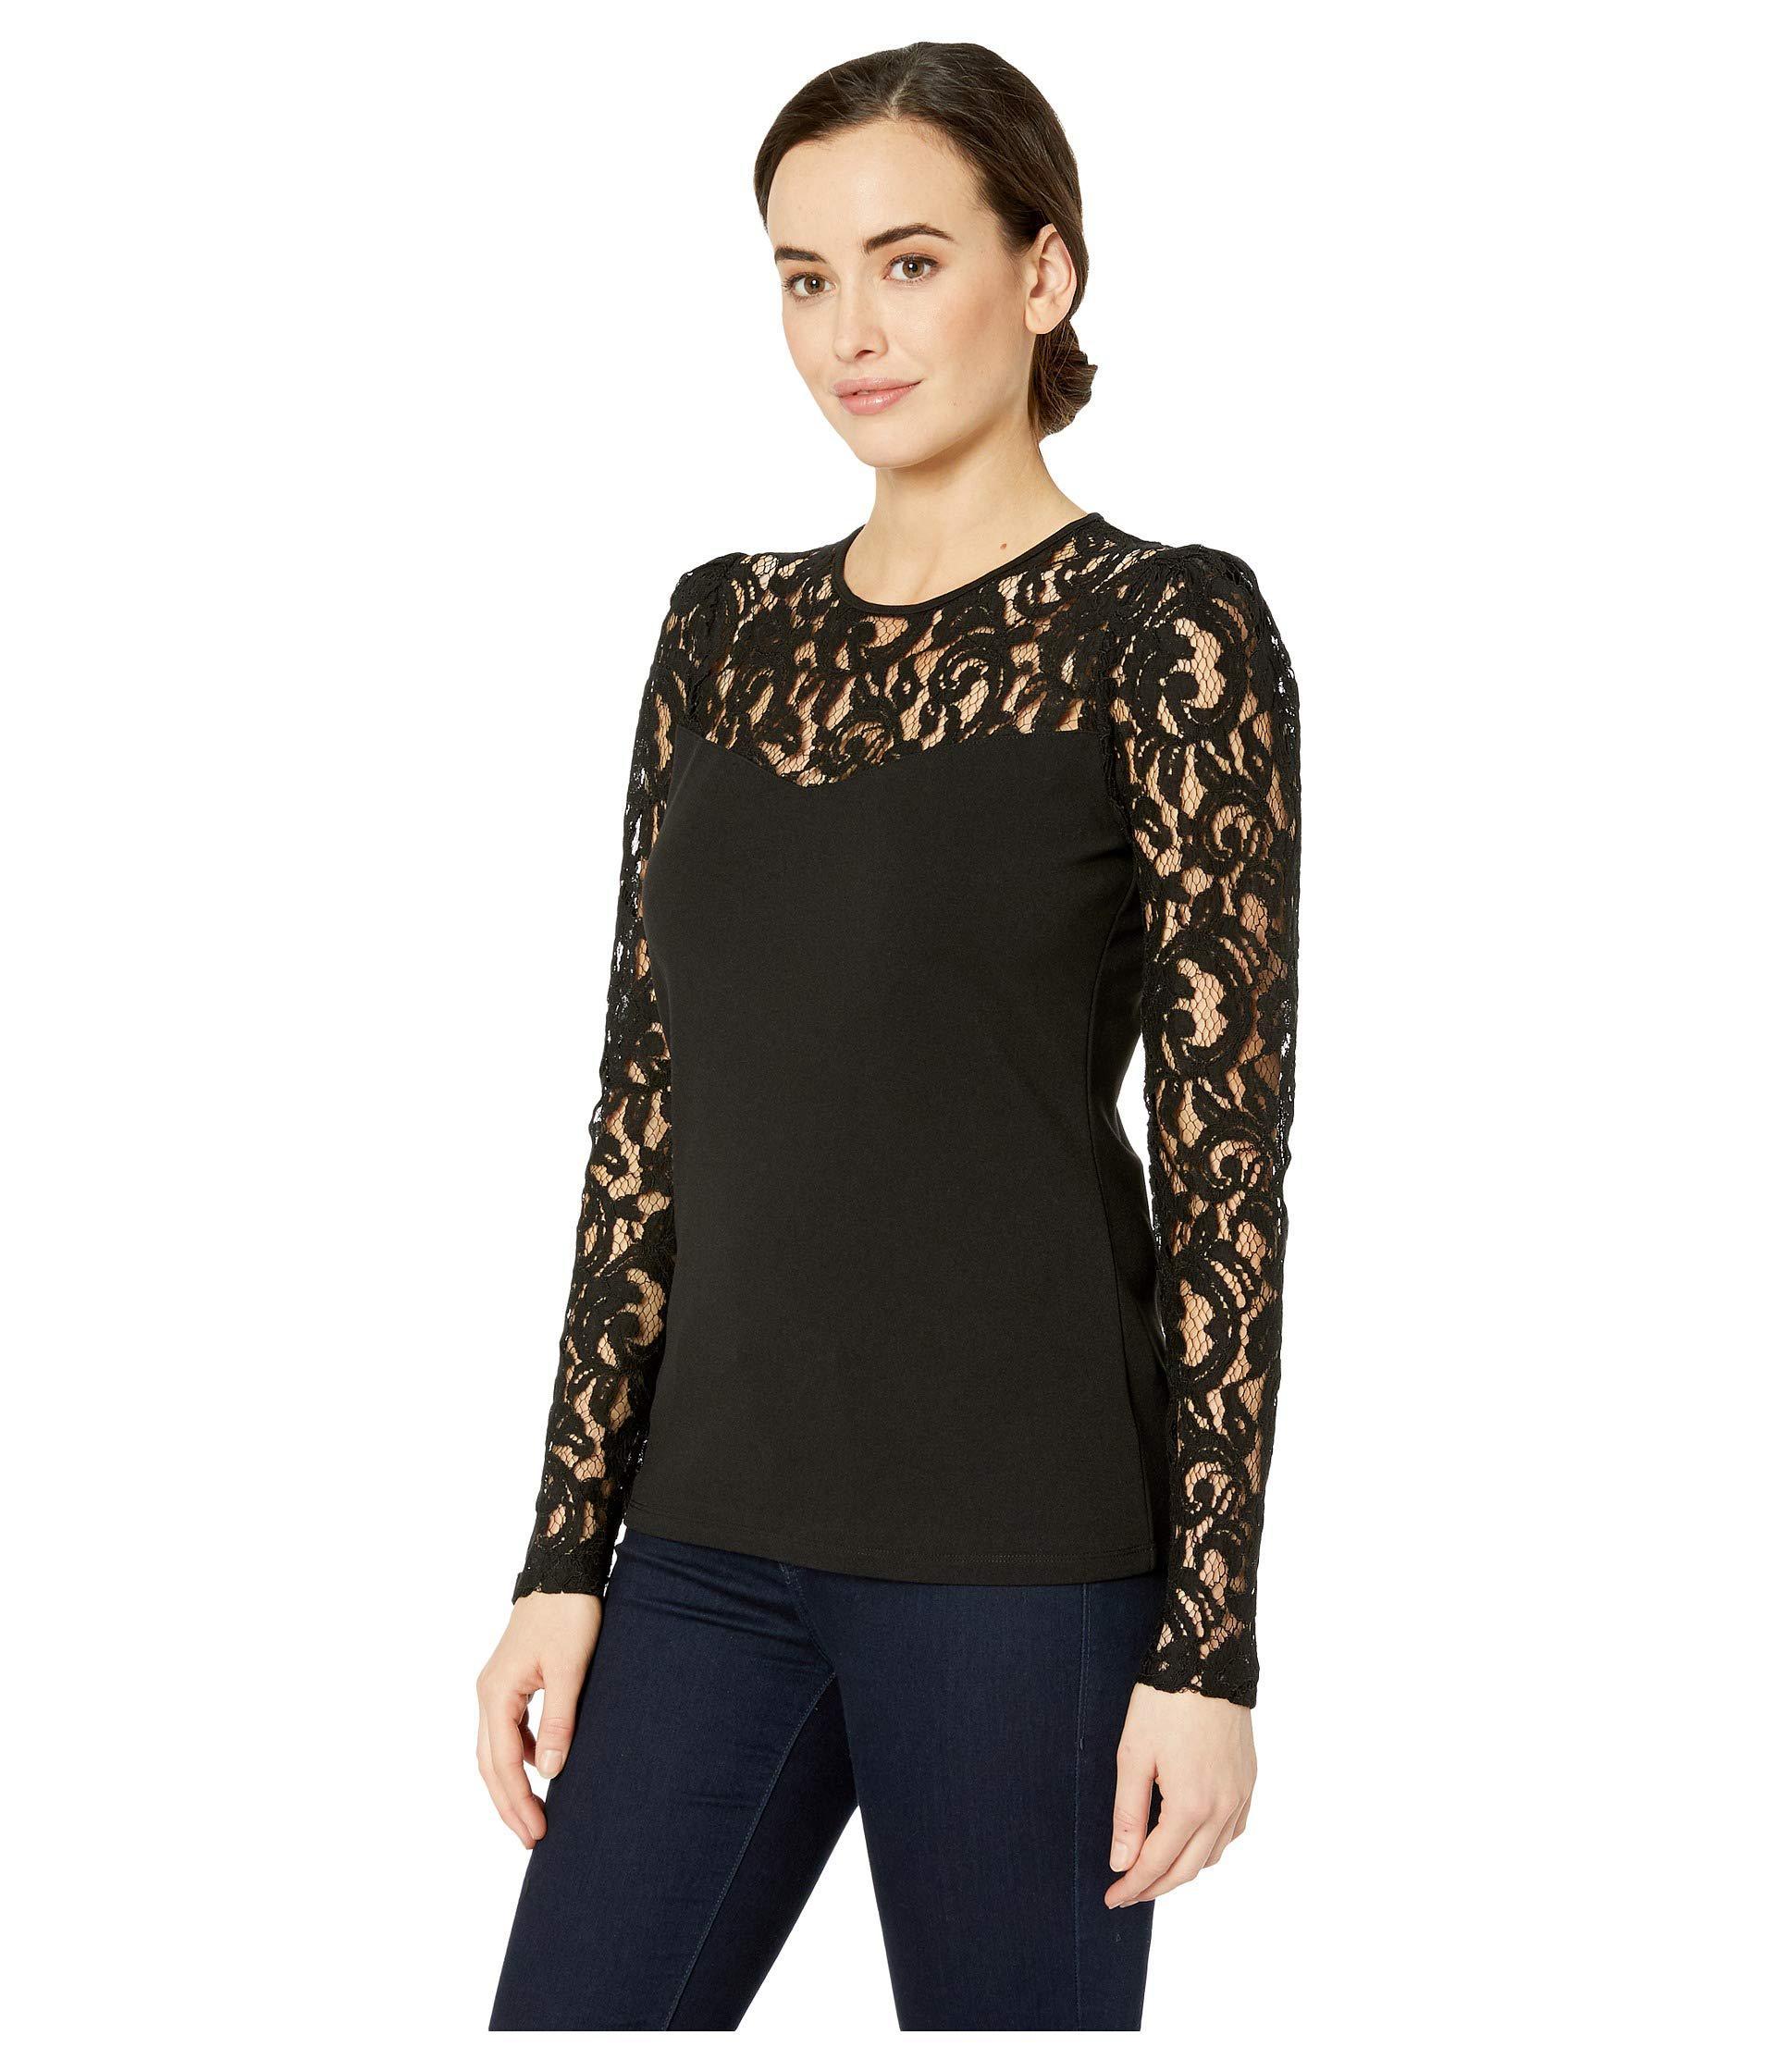 3ddf0455b9b Lyst - MICHAEL Michael Kors Lace Puff Long Sleeve Top (black) Women s  Clothing in Black - Save 41%